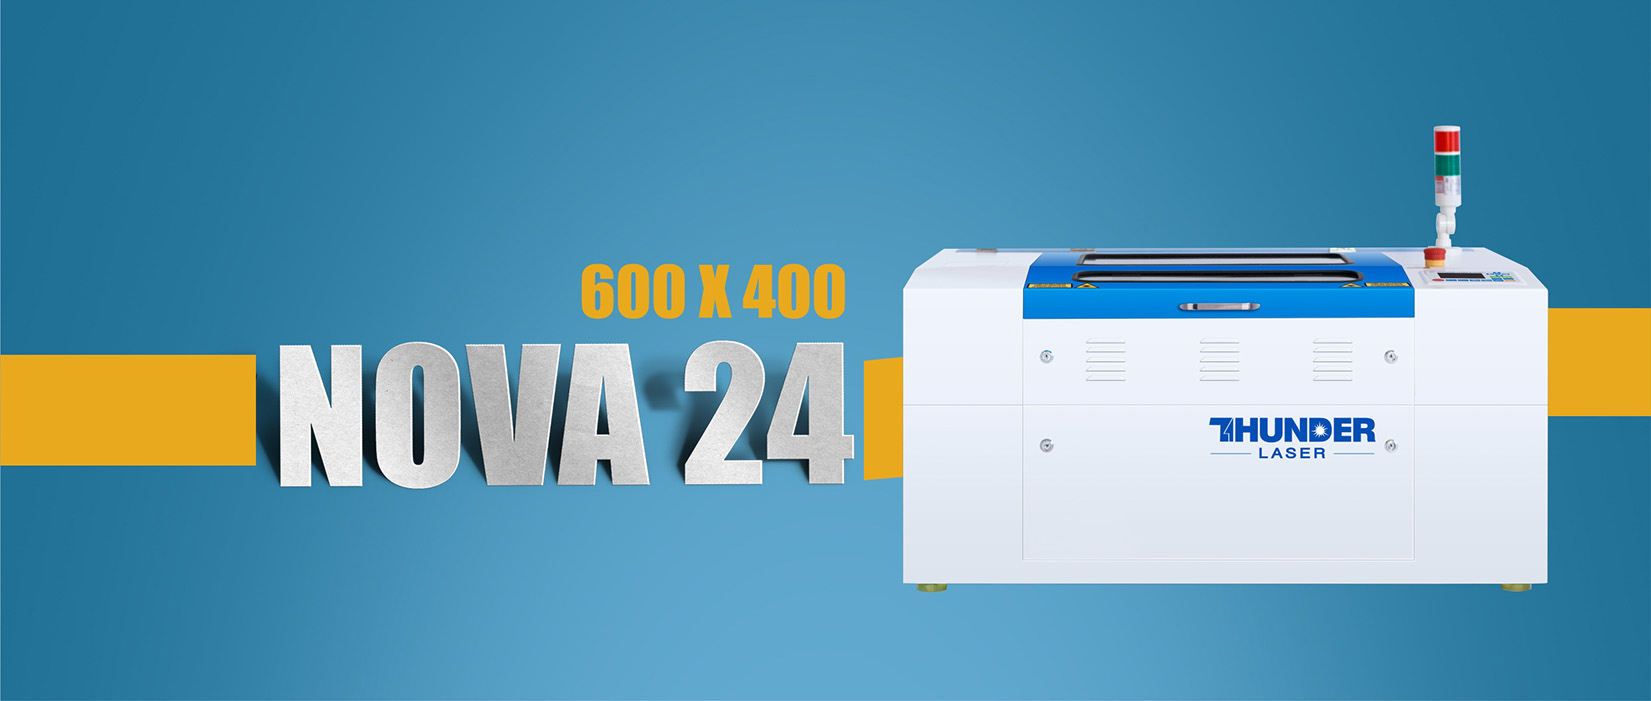 Nova24 desktop laser engraving machine